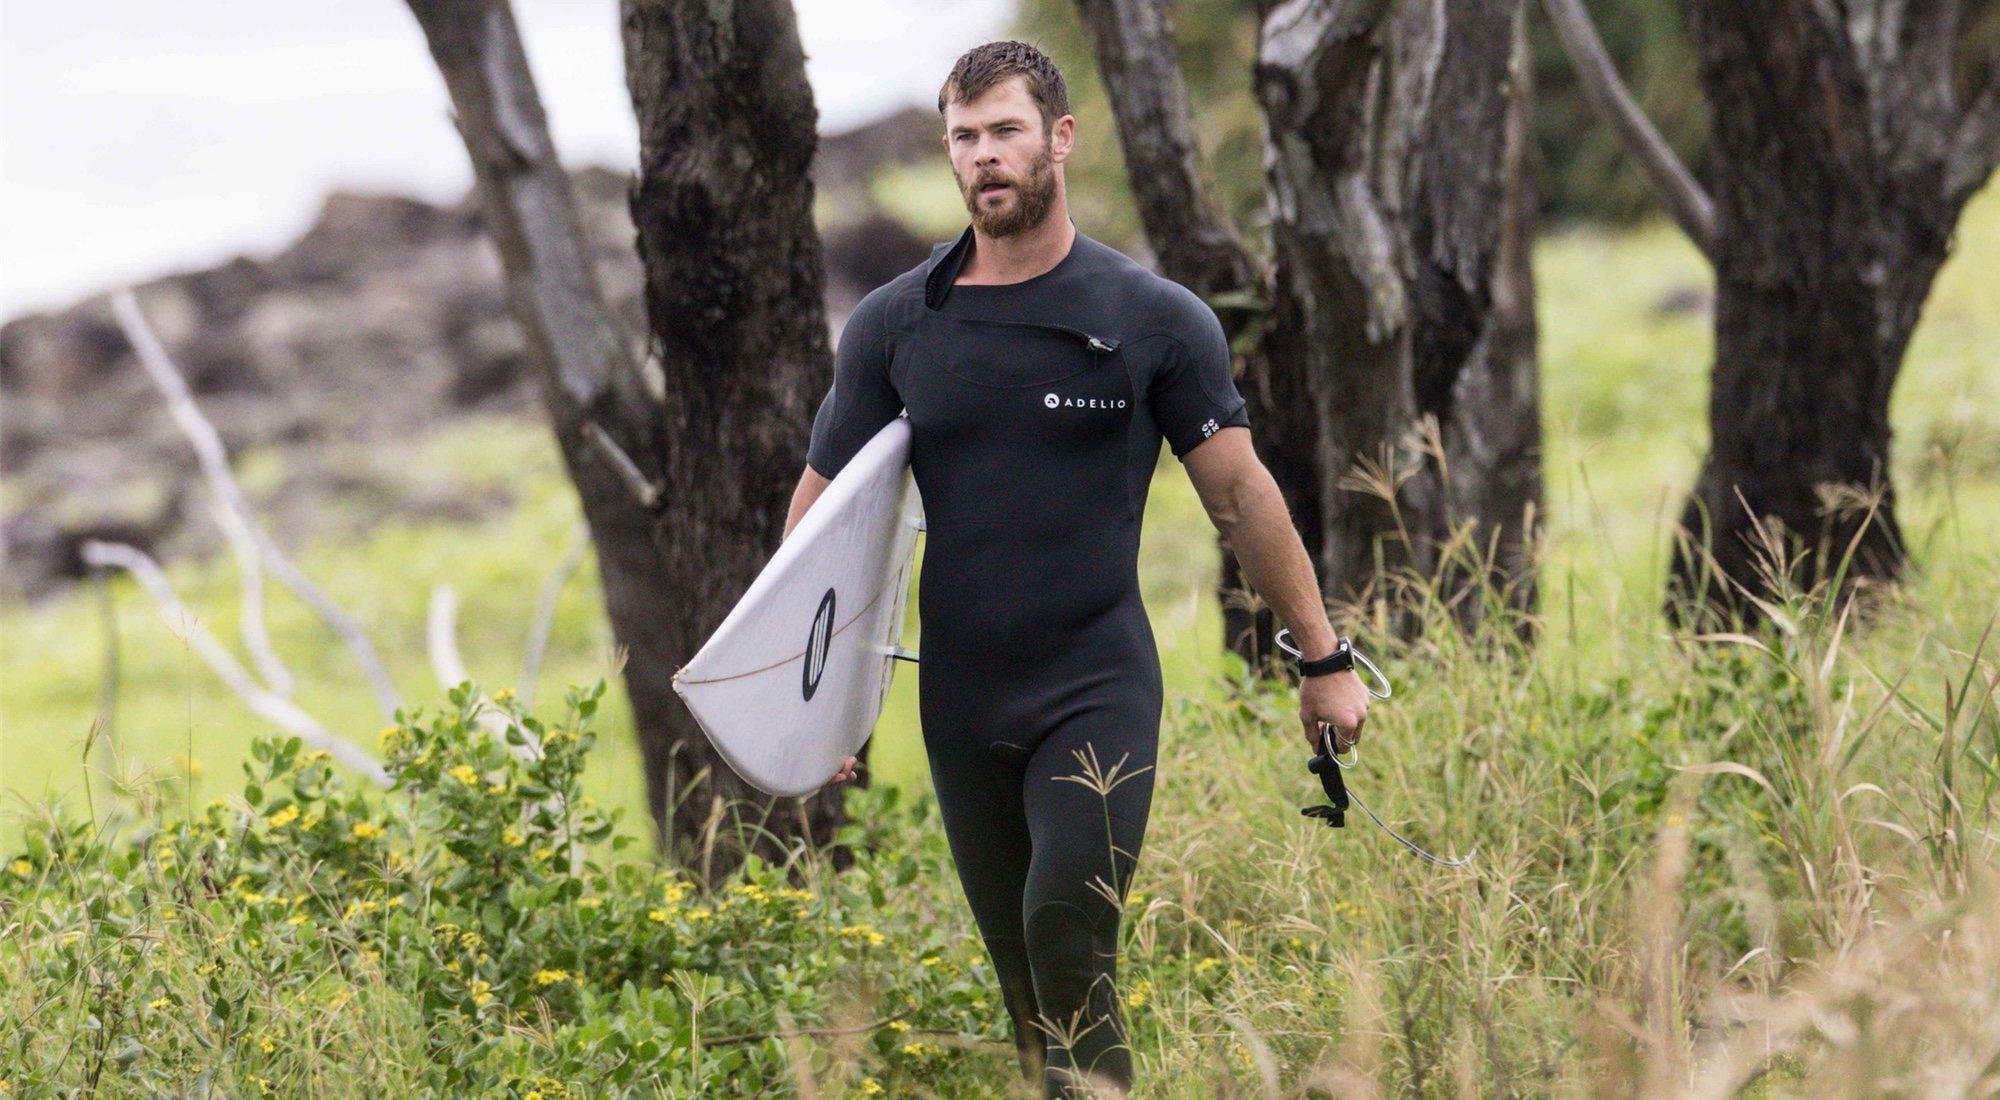 'Centr': Chris Hemsworth nos enseña su rutina de entrenamiento